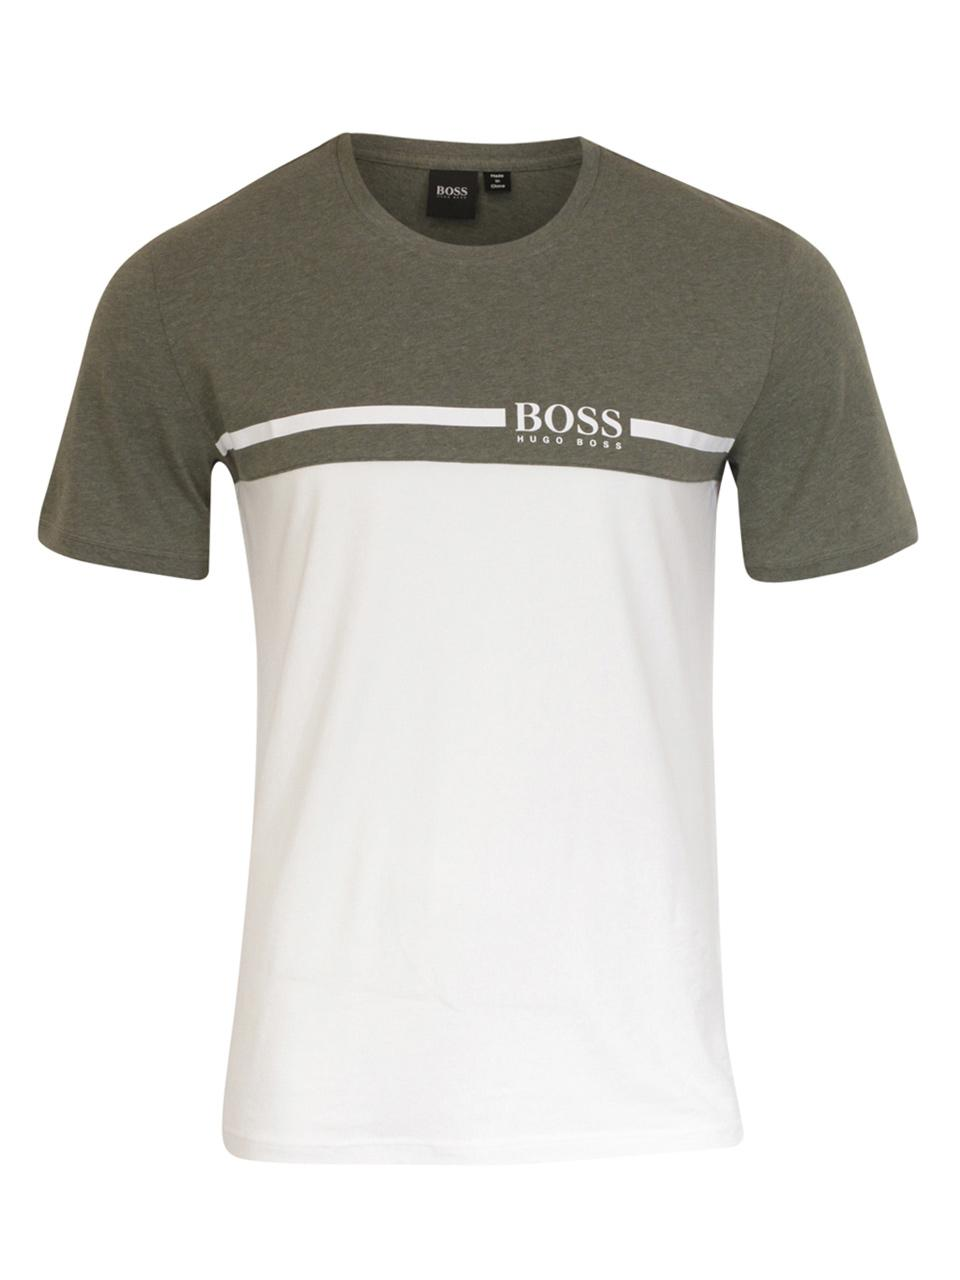 907e06ceb3e Hugo Boss Men's Trend Short Sleeve Crew Neck T-Shirt